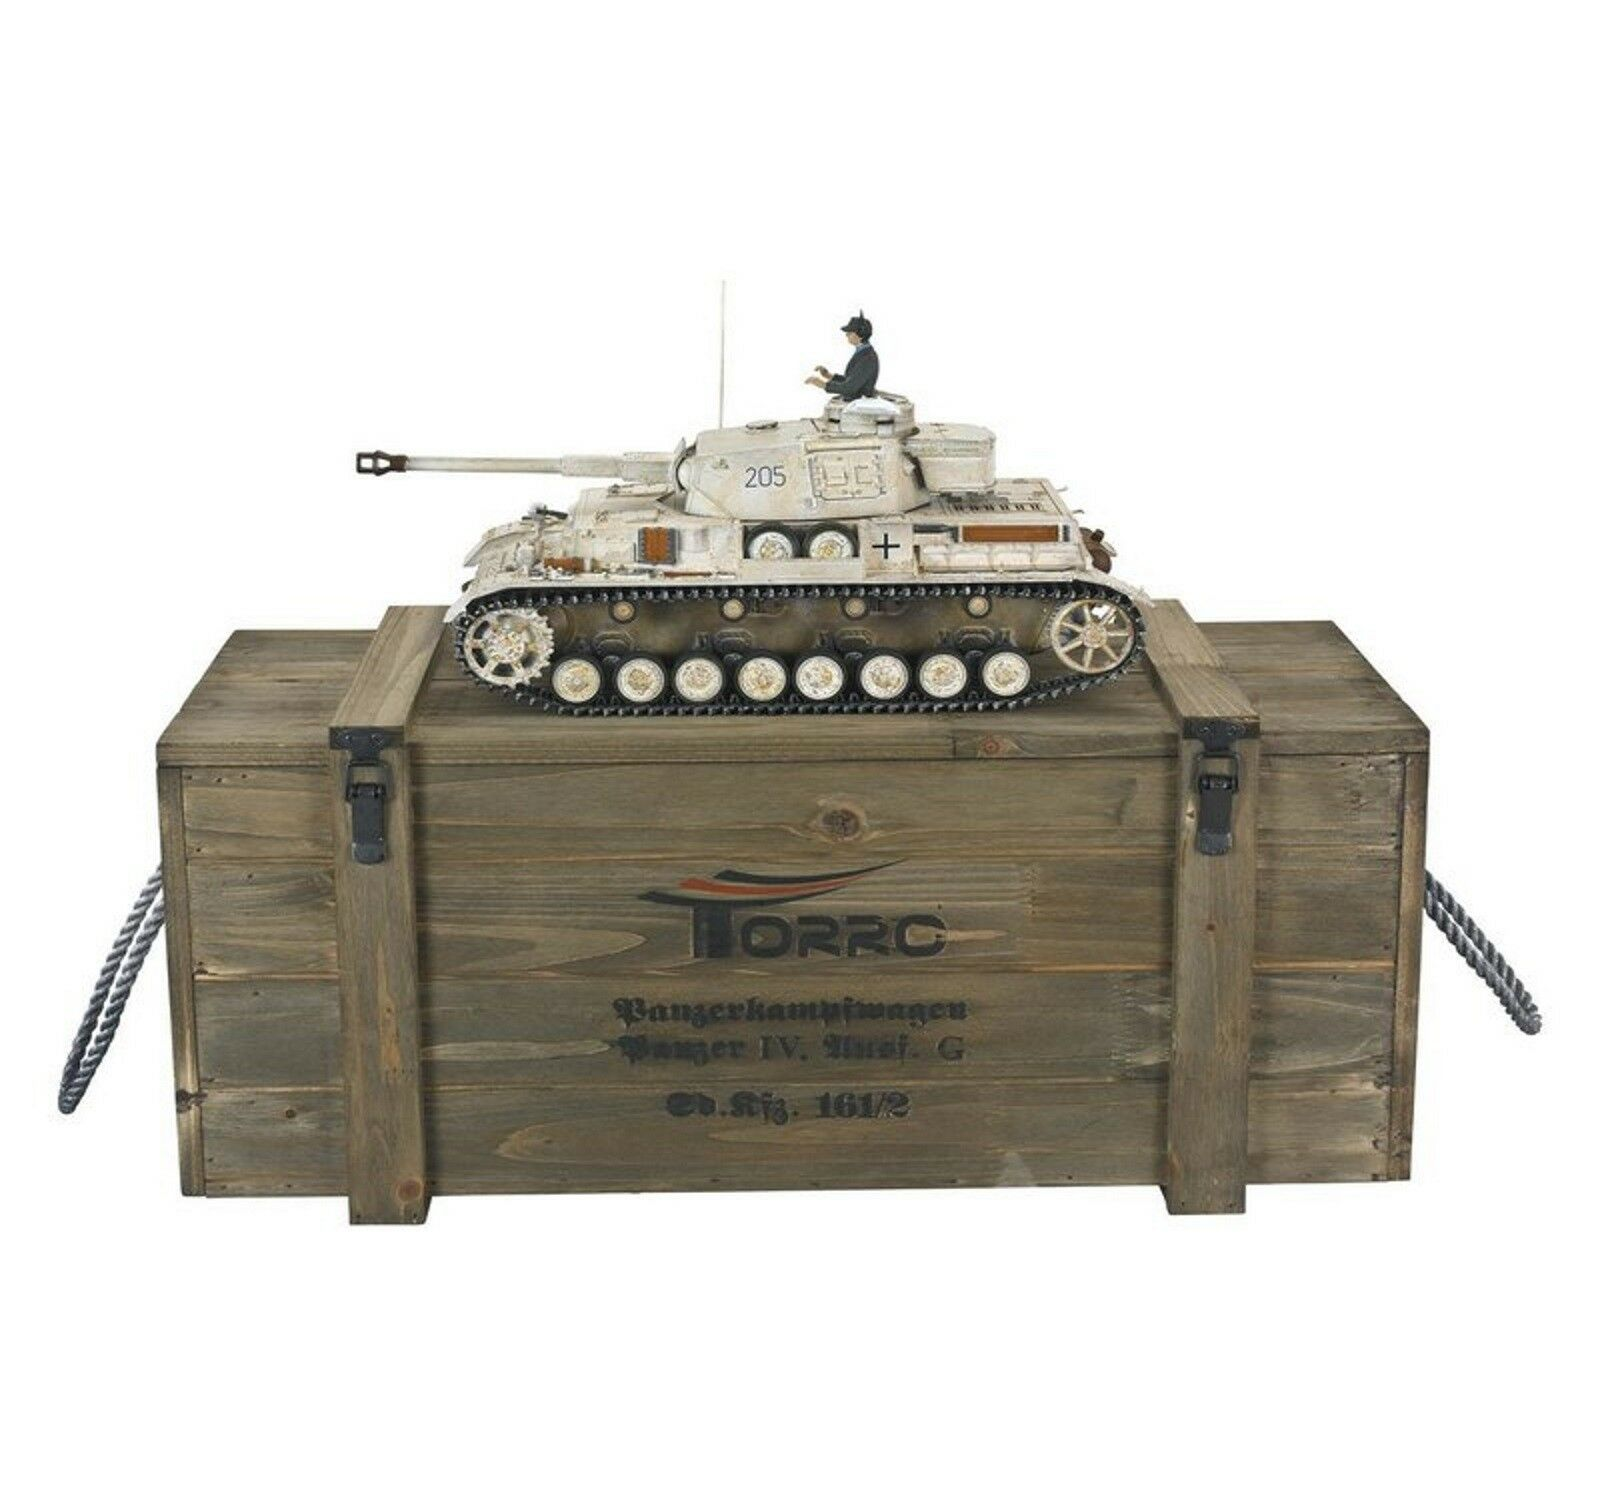 Torro 1 16 RC Panzer Kpfw IV.G Div. LAH Kharkov1943 B 1110385901 Metall